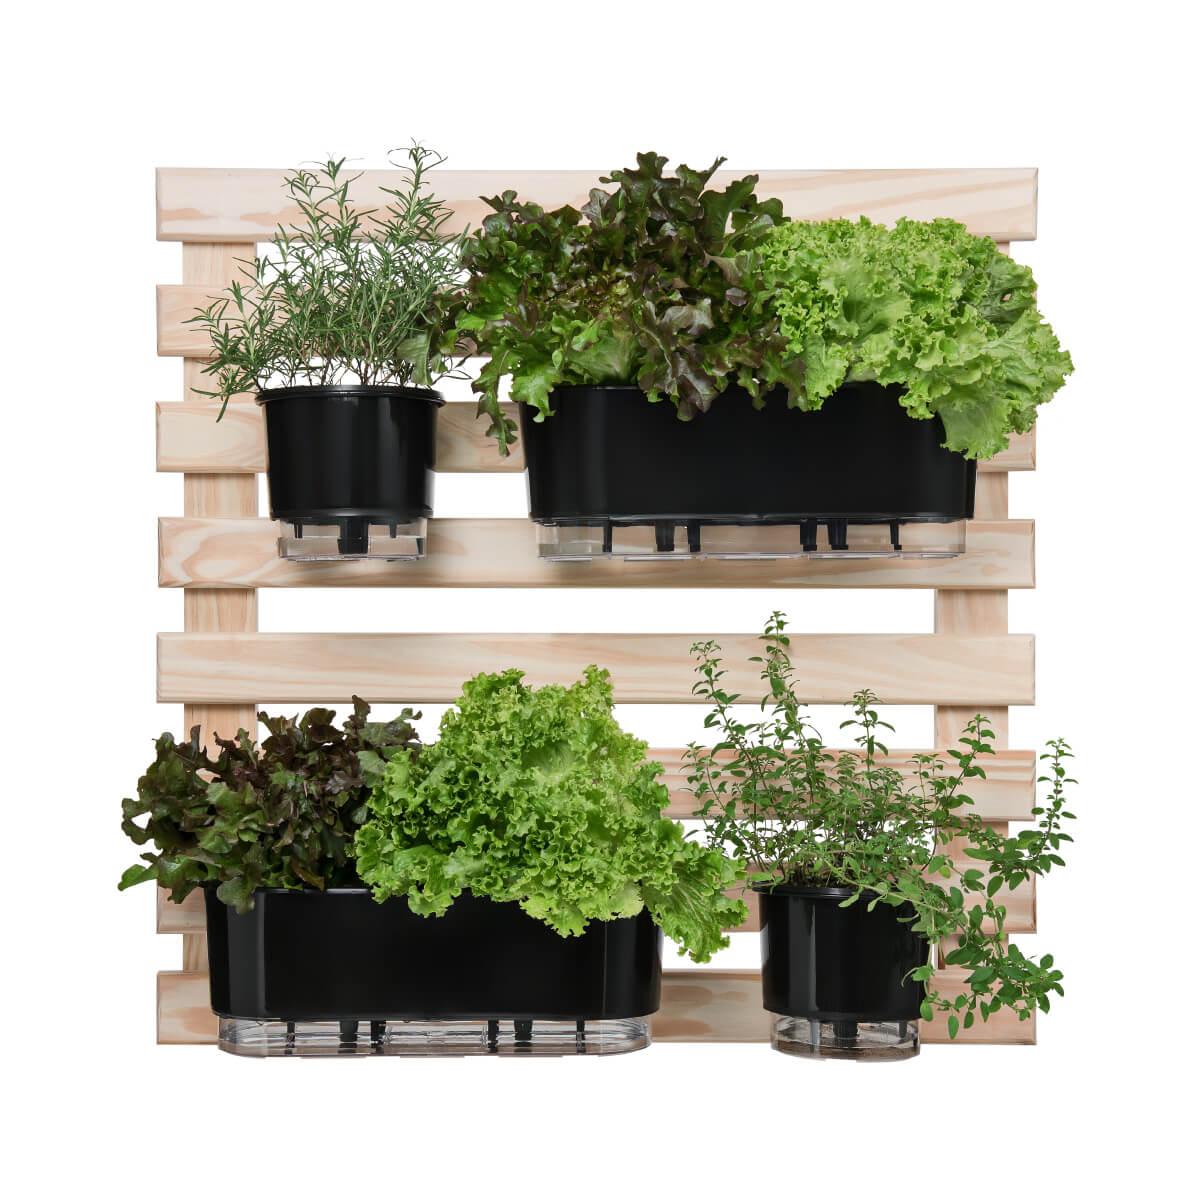 Kit Horta Vertical 80cm x 80cm com 2 Jardineiras e 2 Vasos Pretos  - Loja Raiz